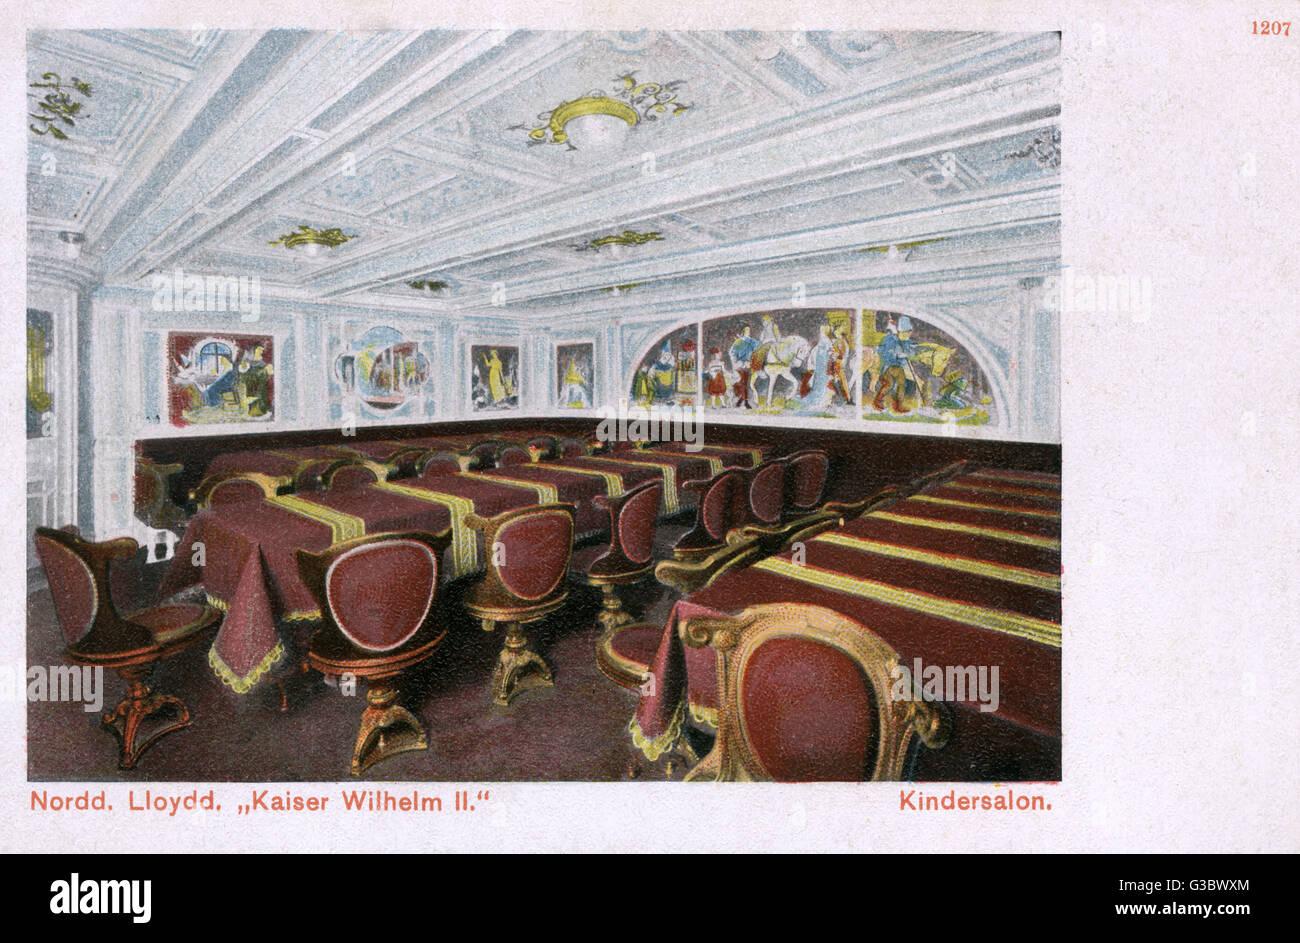 Interior of the SS Kaiser Wilhelm II passenger steamer of Norddeutscher Lloyd (NDL) (North German Lloyd), a German Stock Photo